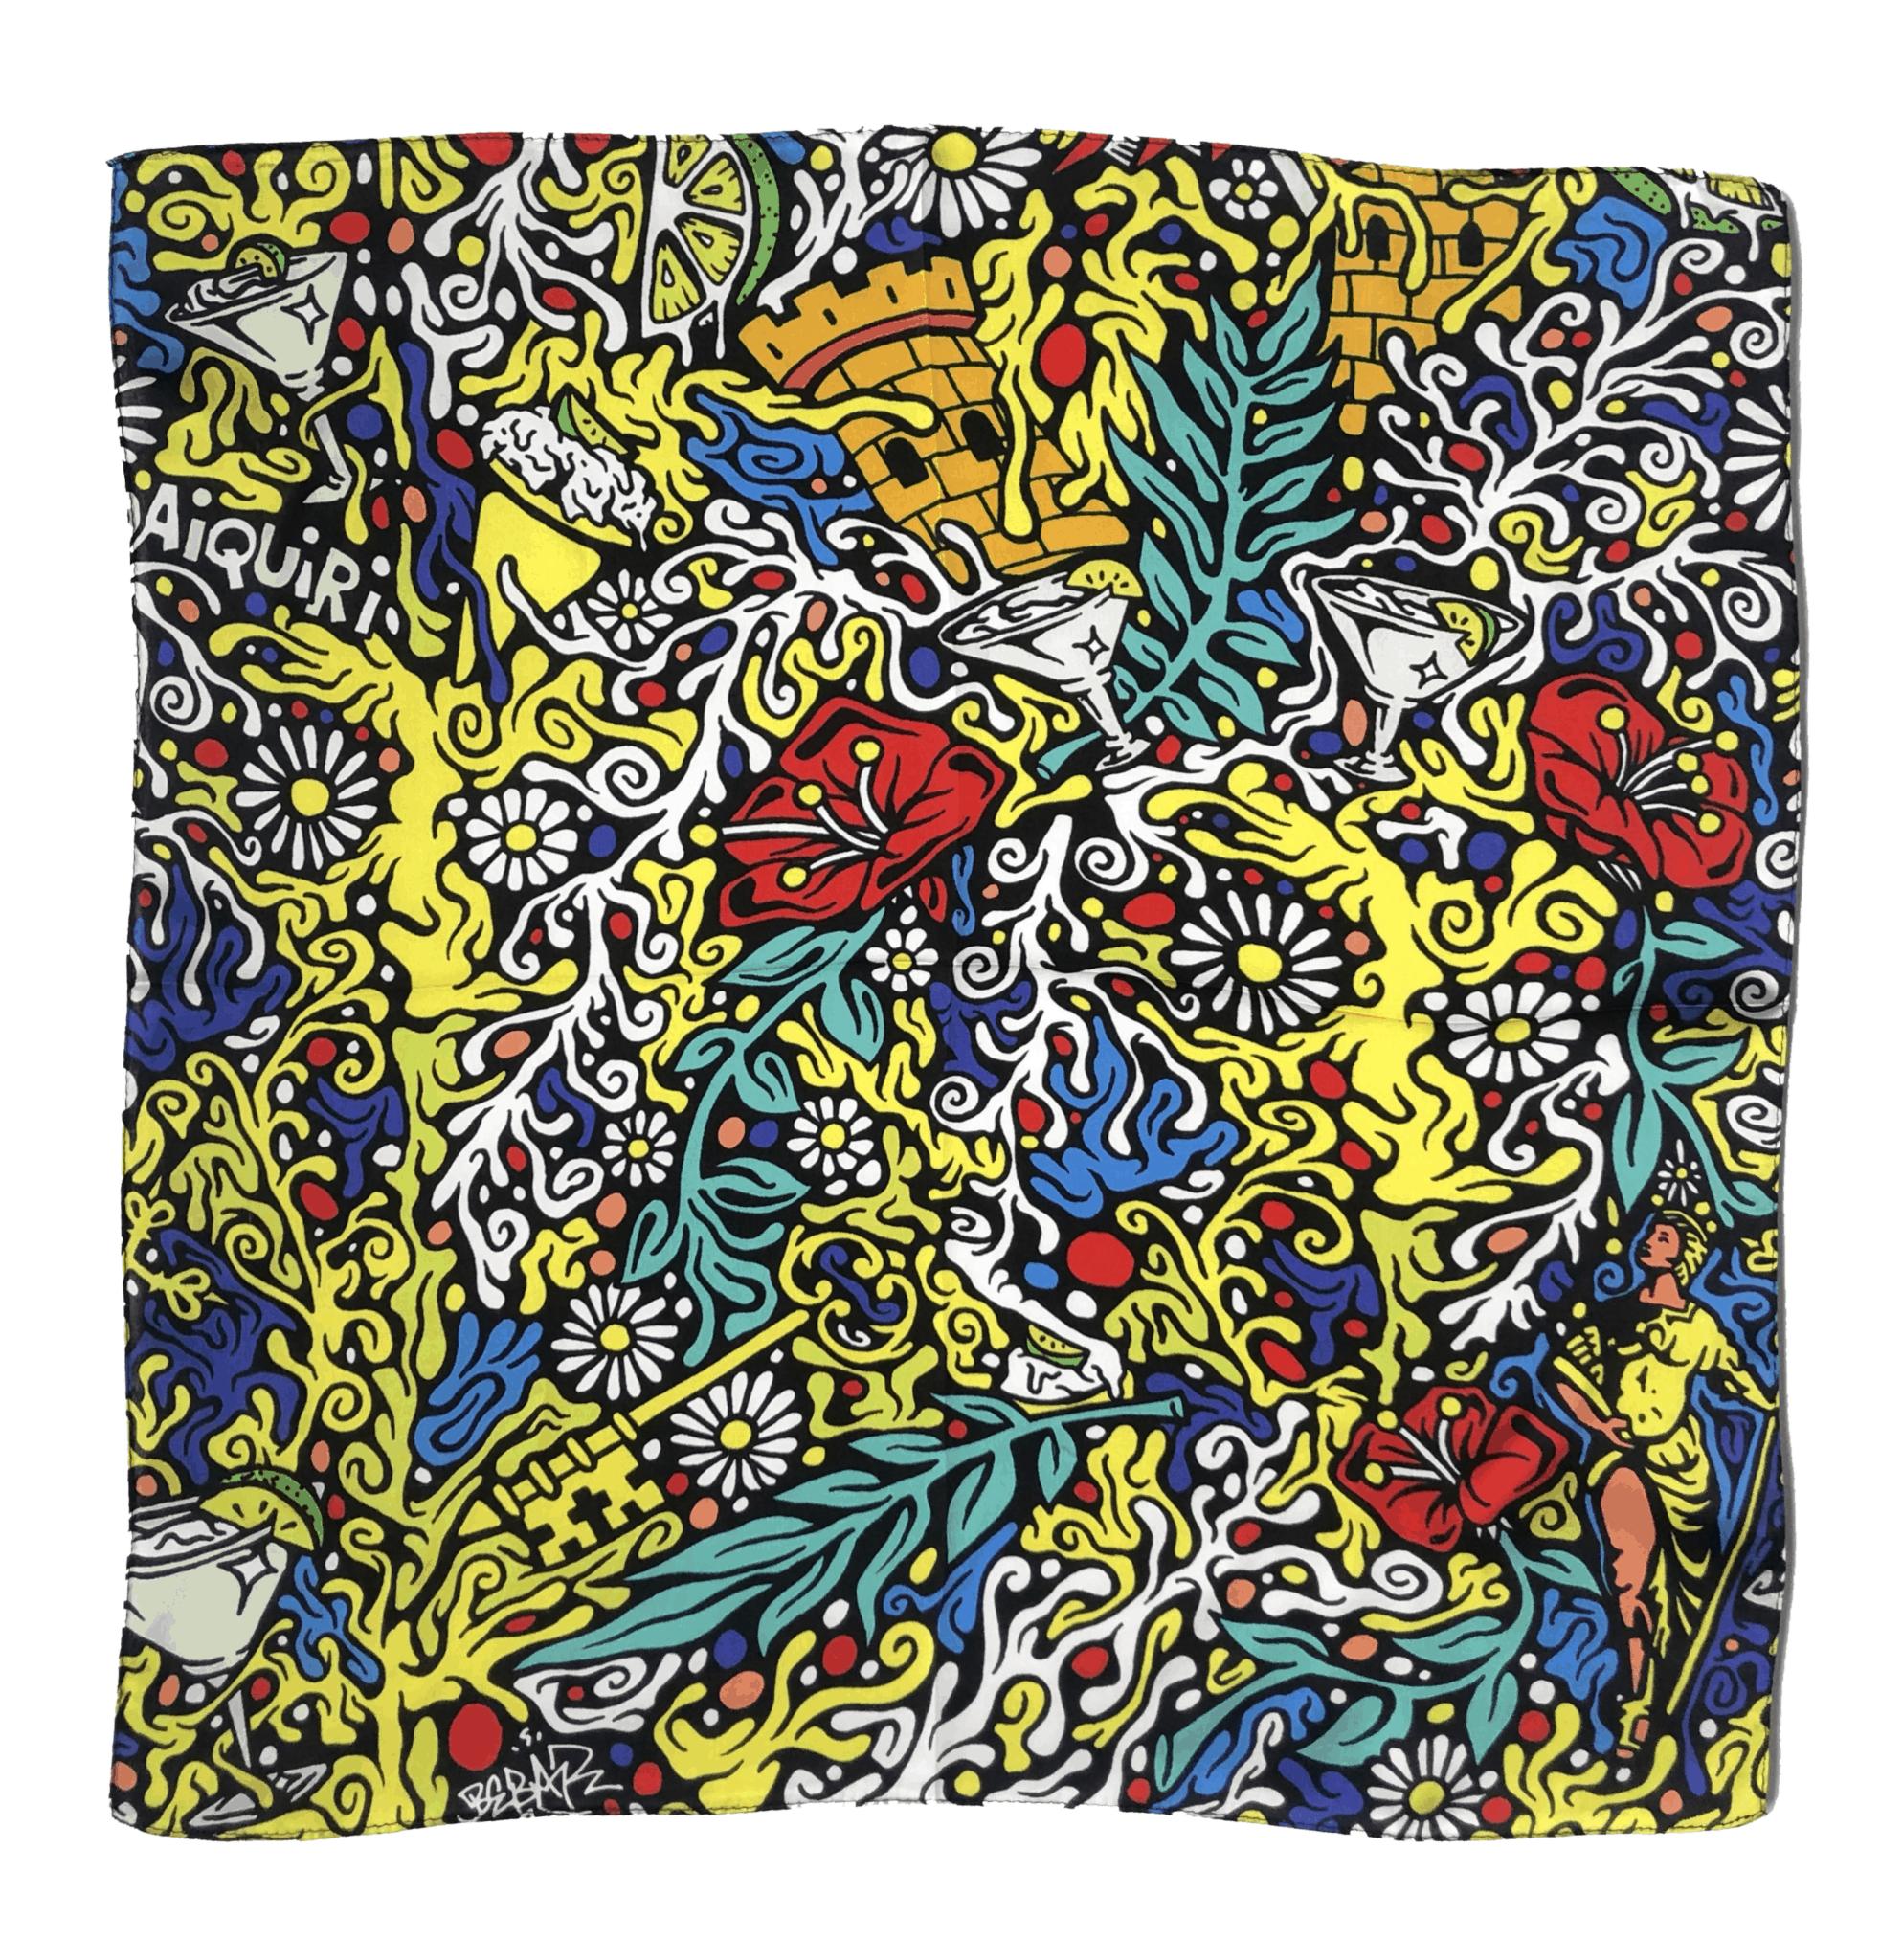 silk scarf-cuba made me